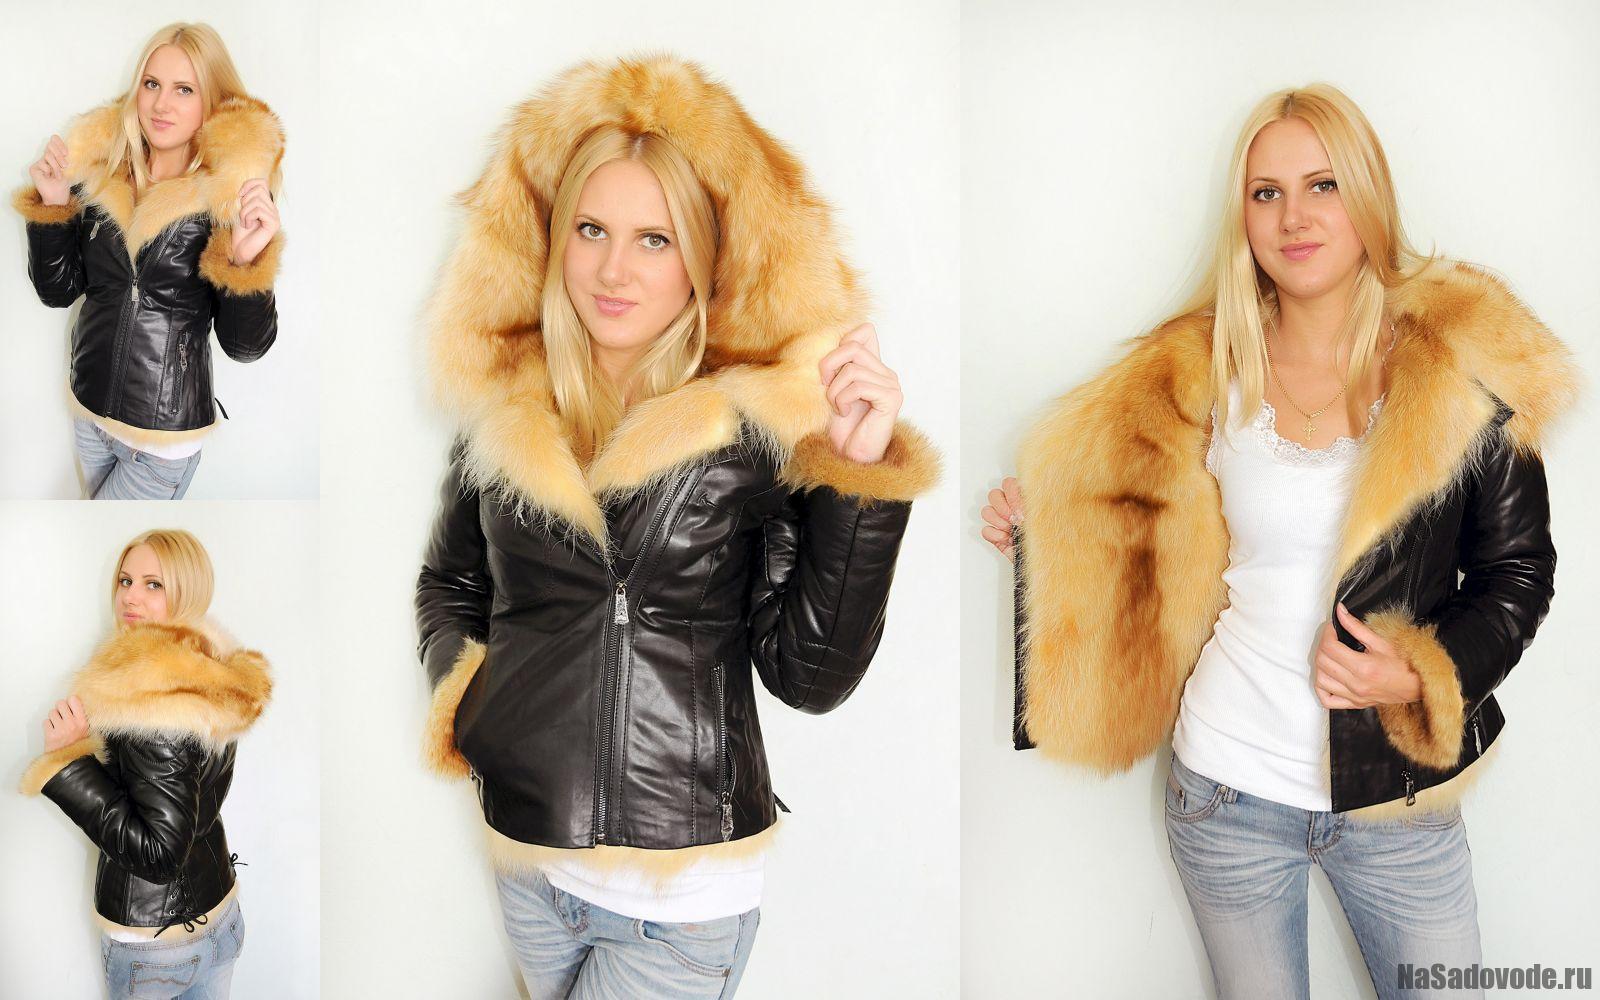 Меховая куртка на Садоводе